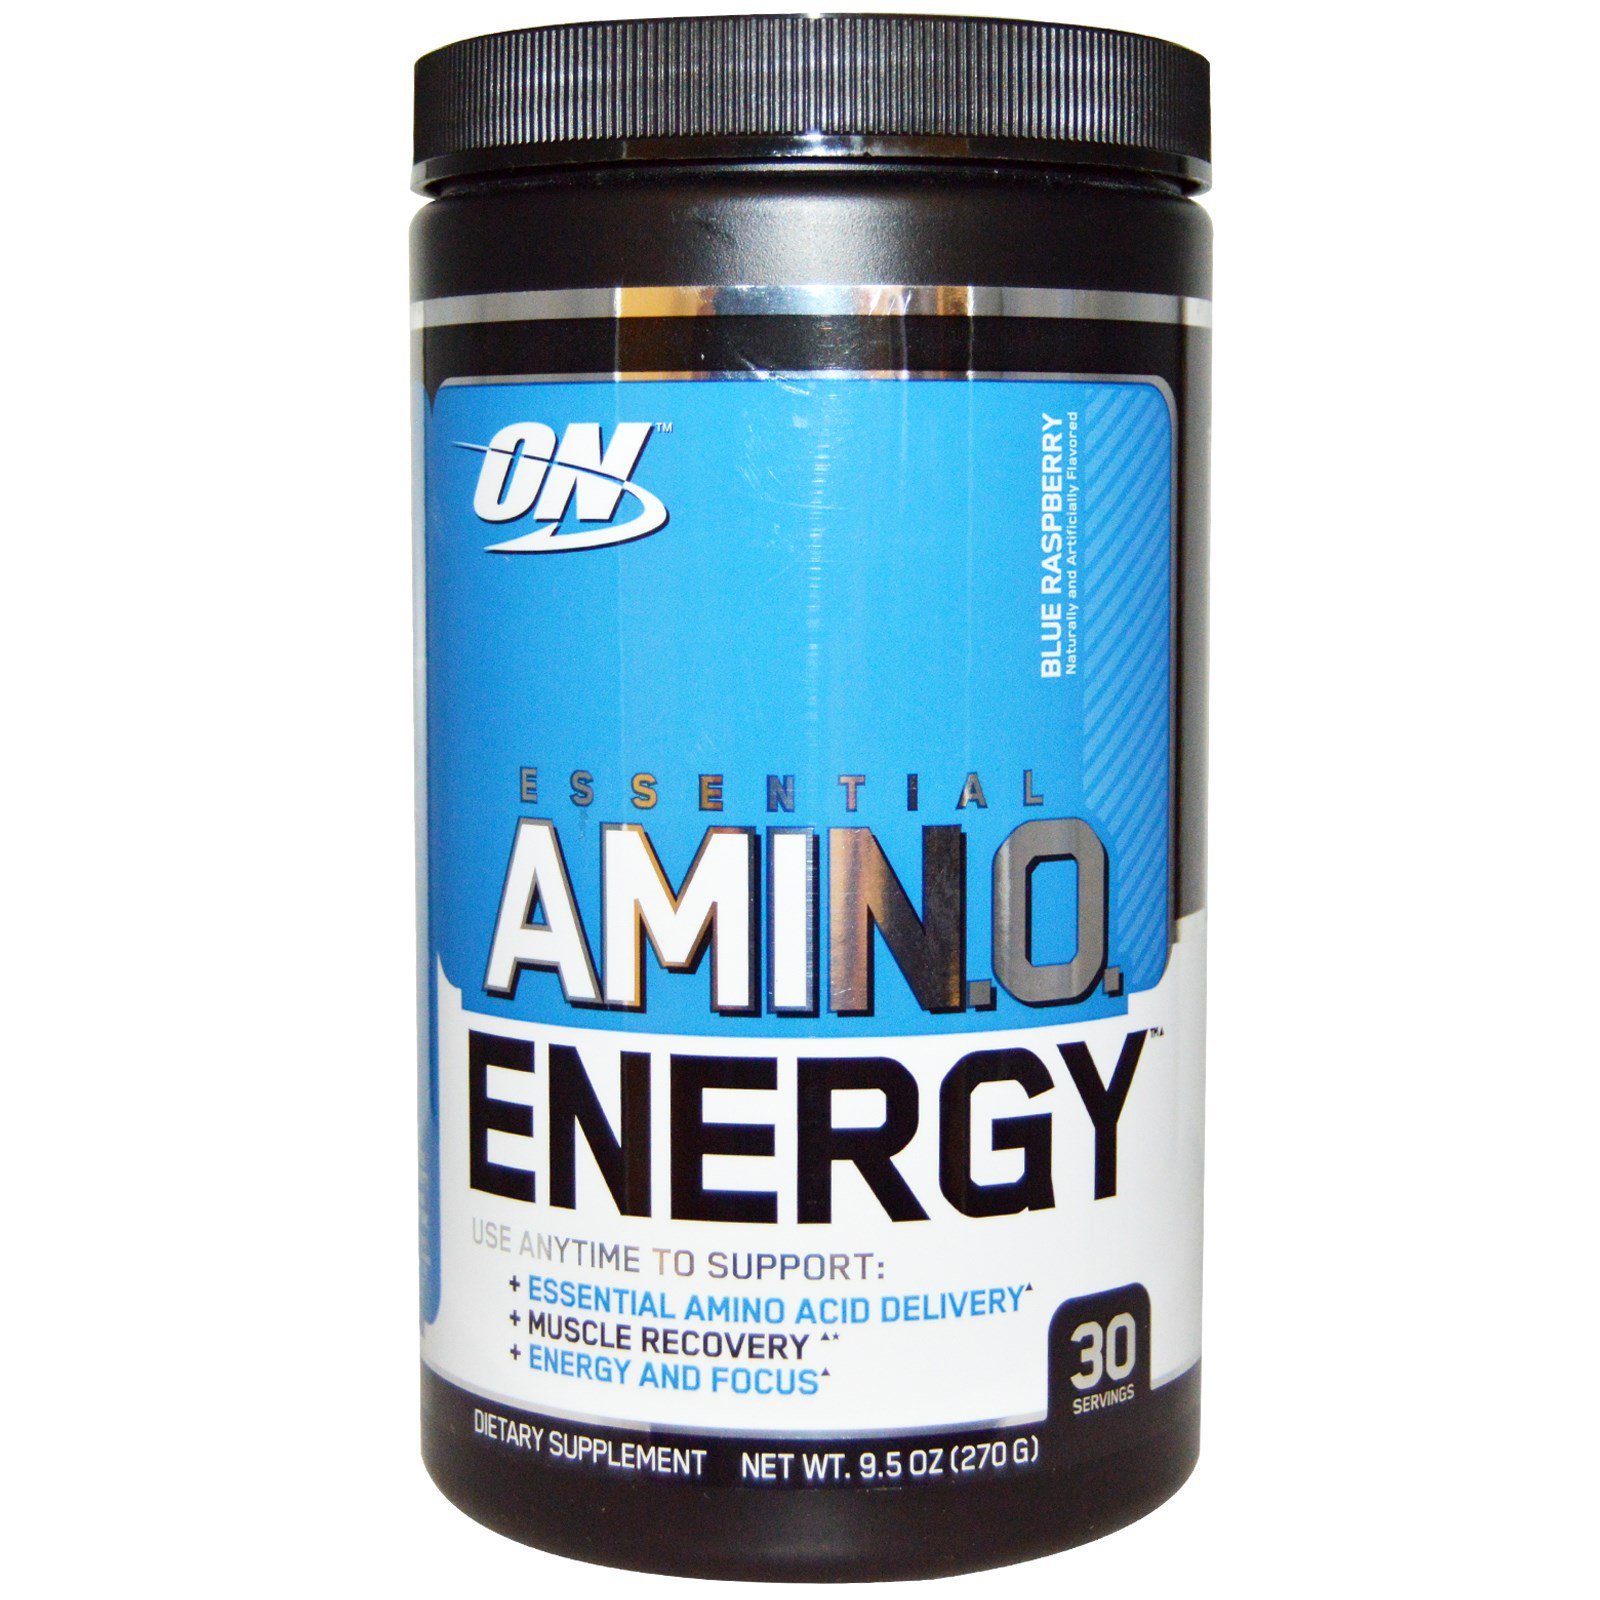 On essential amino energy